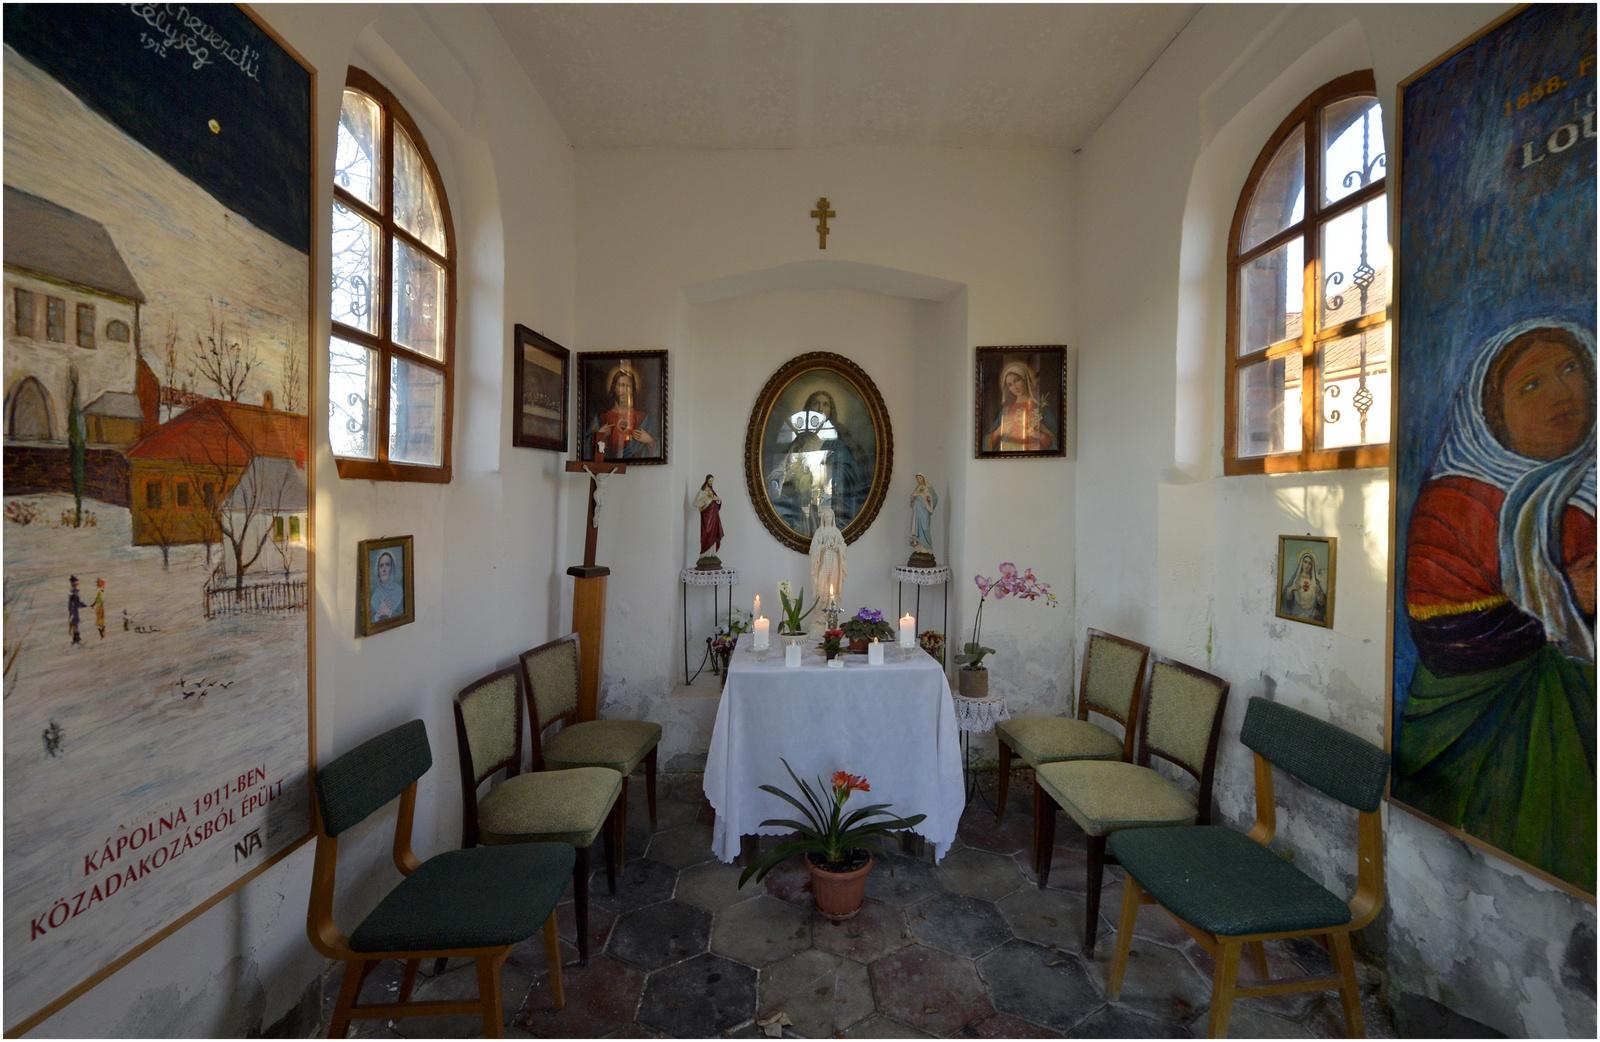 Kápolna belülről